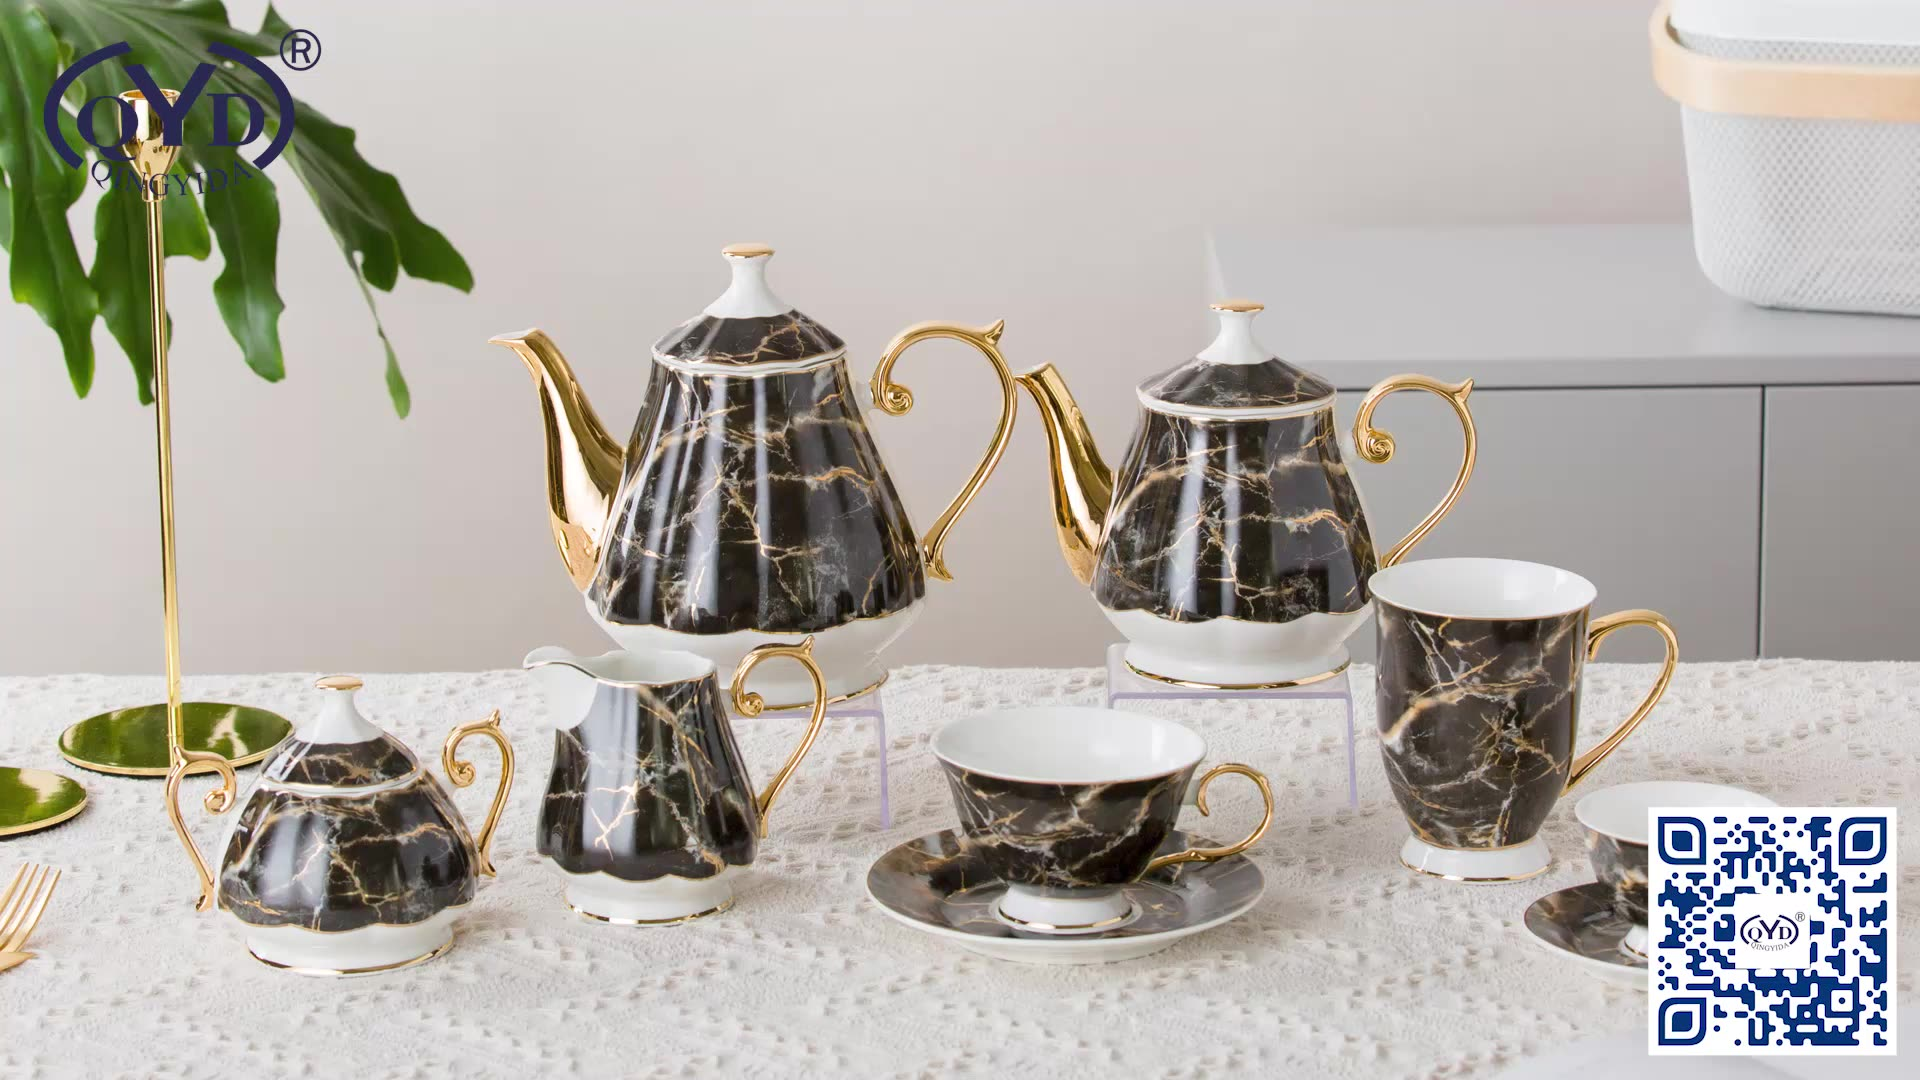 Unique black marble gold rim porcelain tea mug ceramic coffee cup and saucer